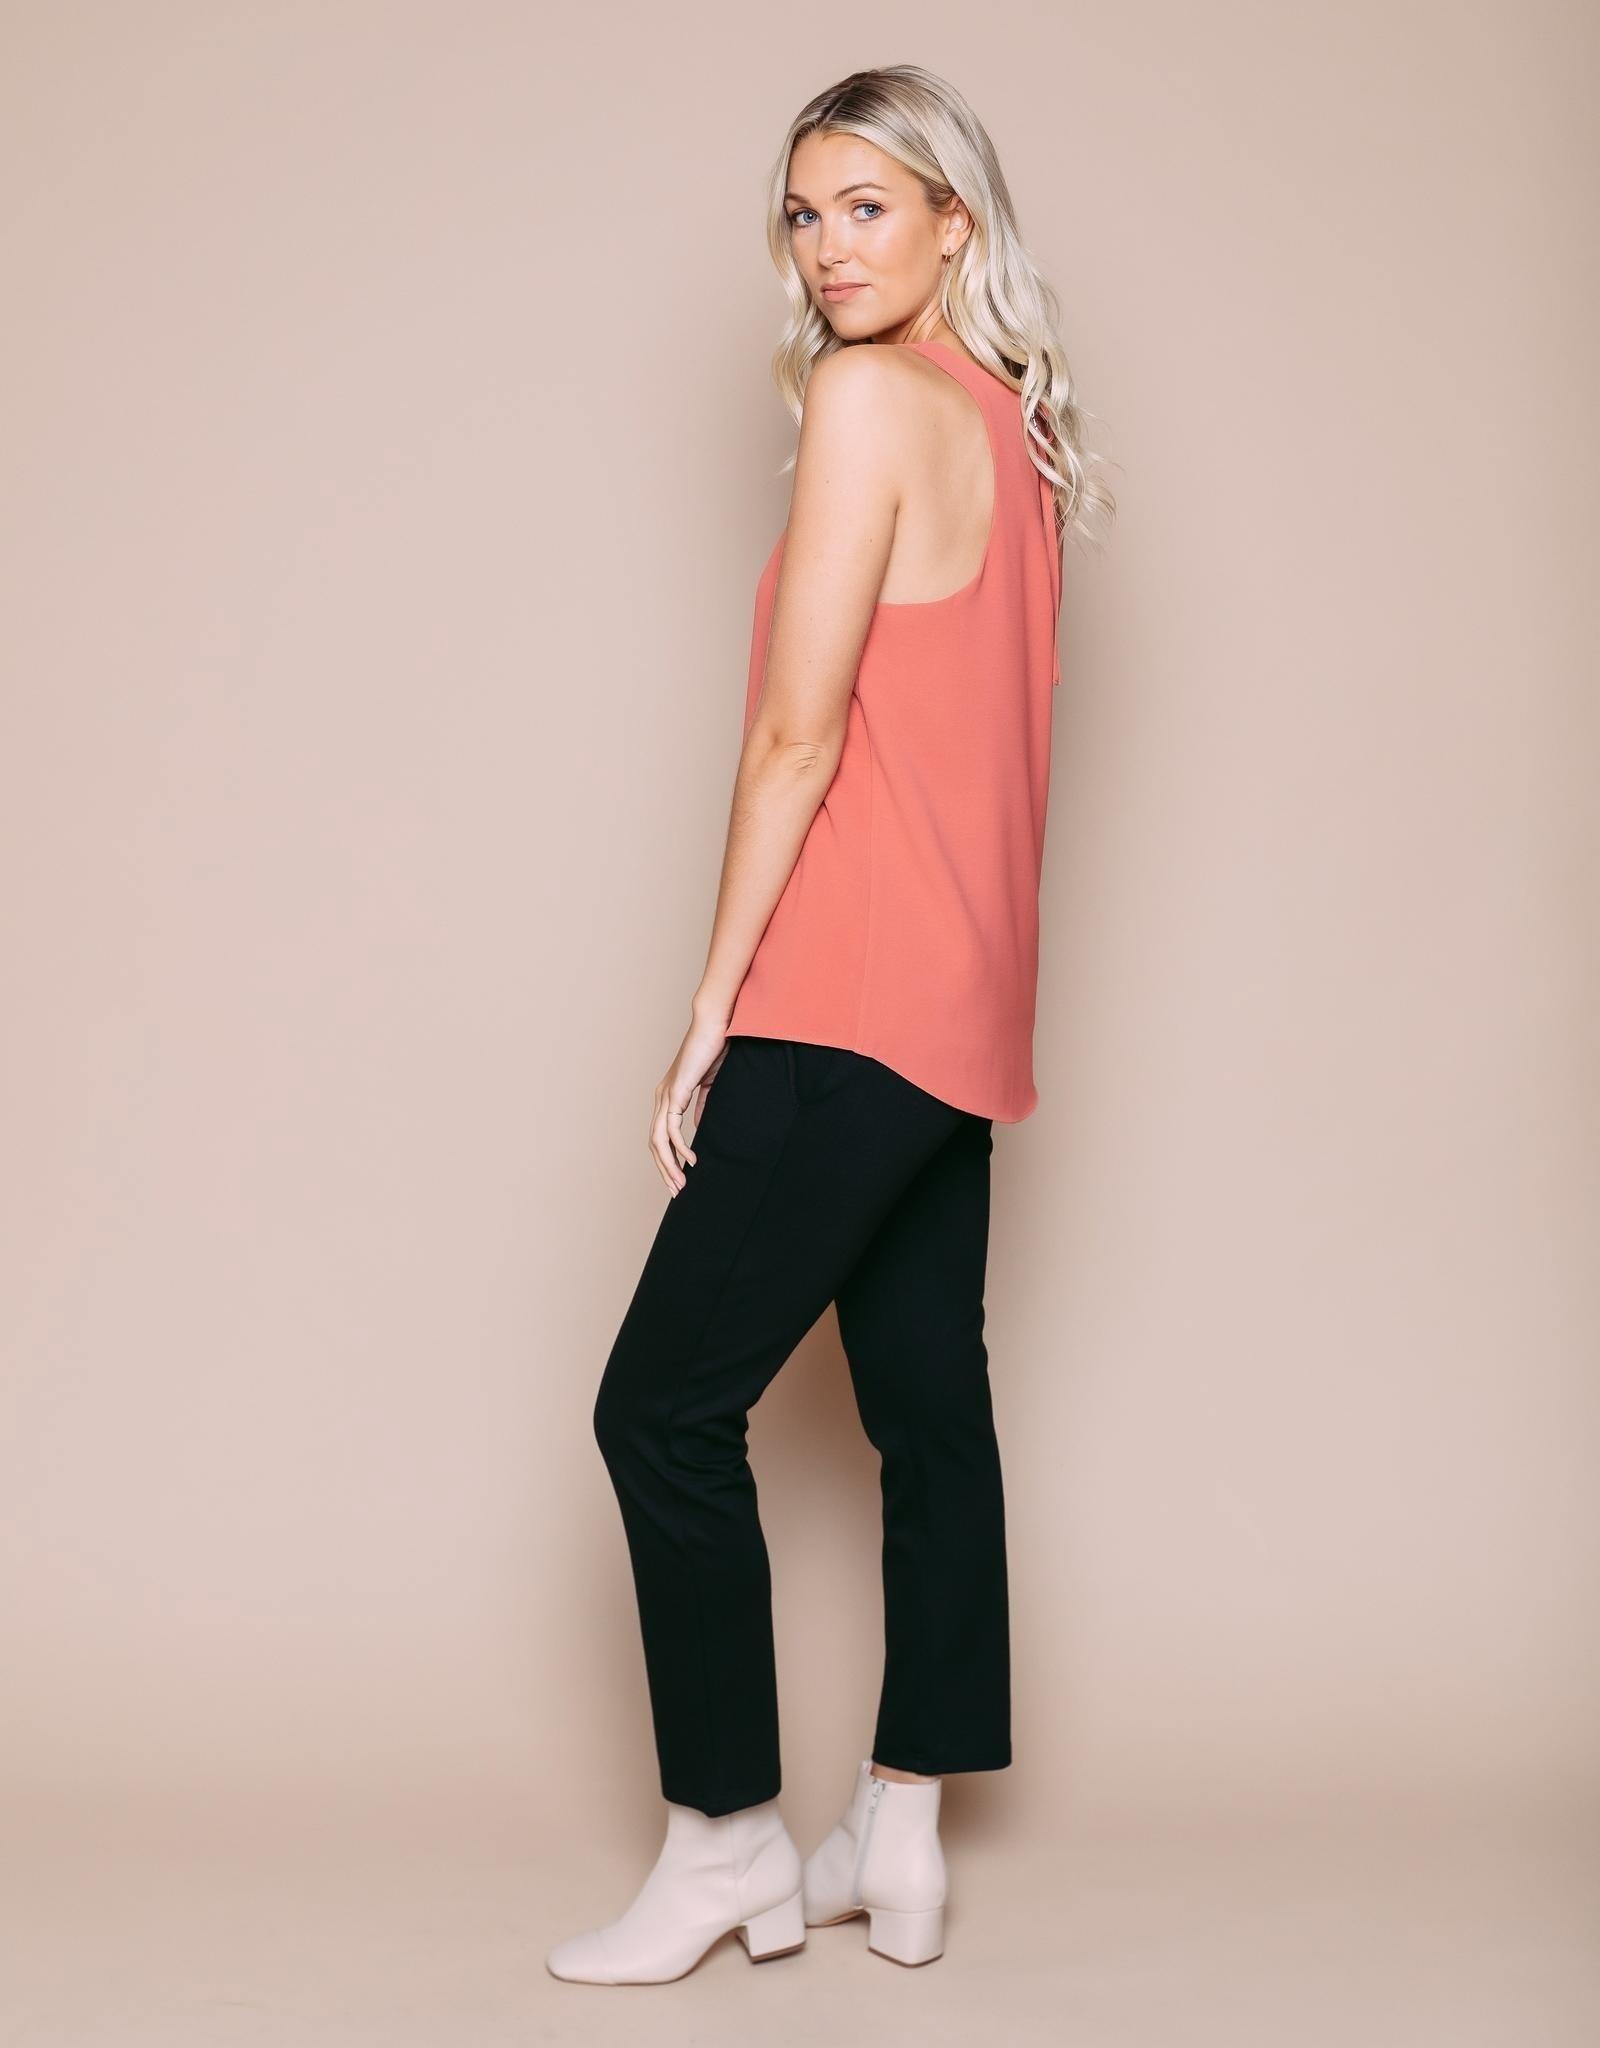 Orb Clothing Maddie Cami